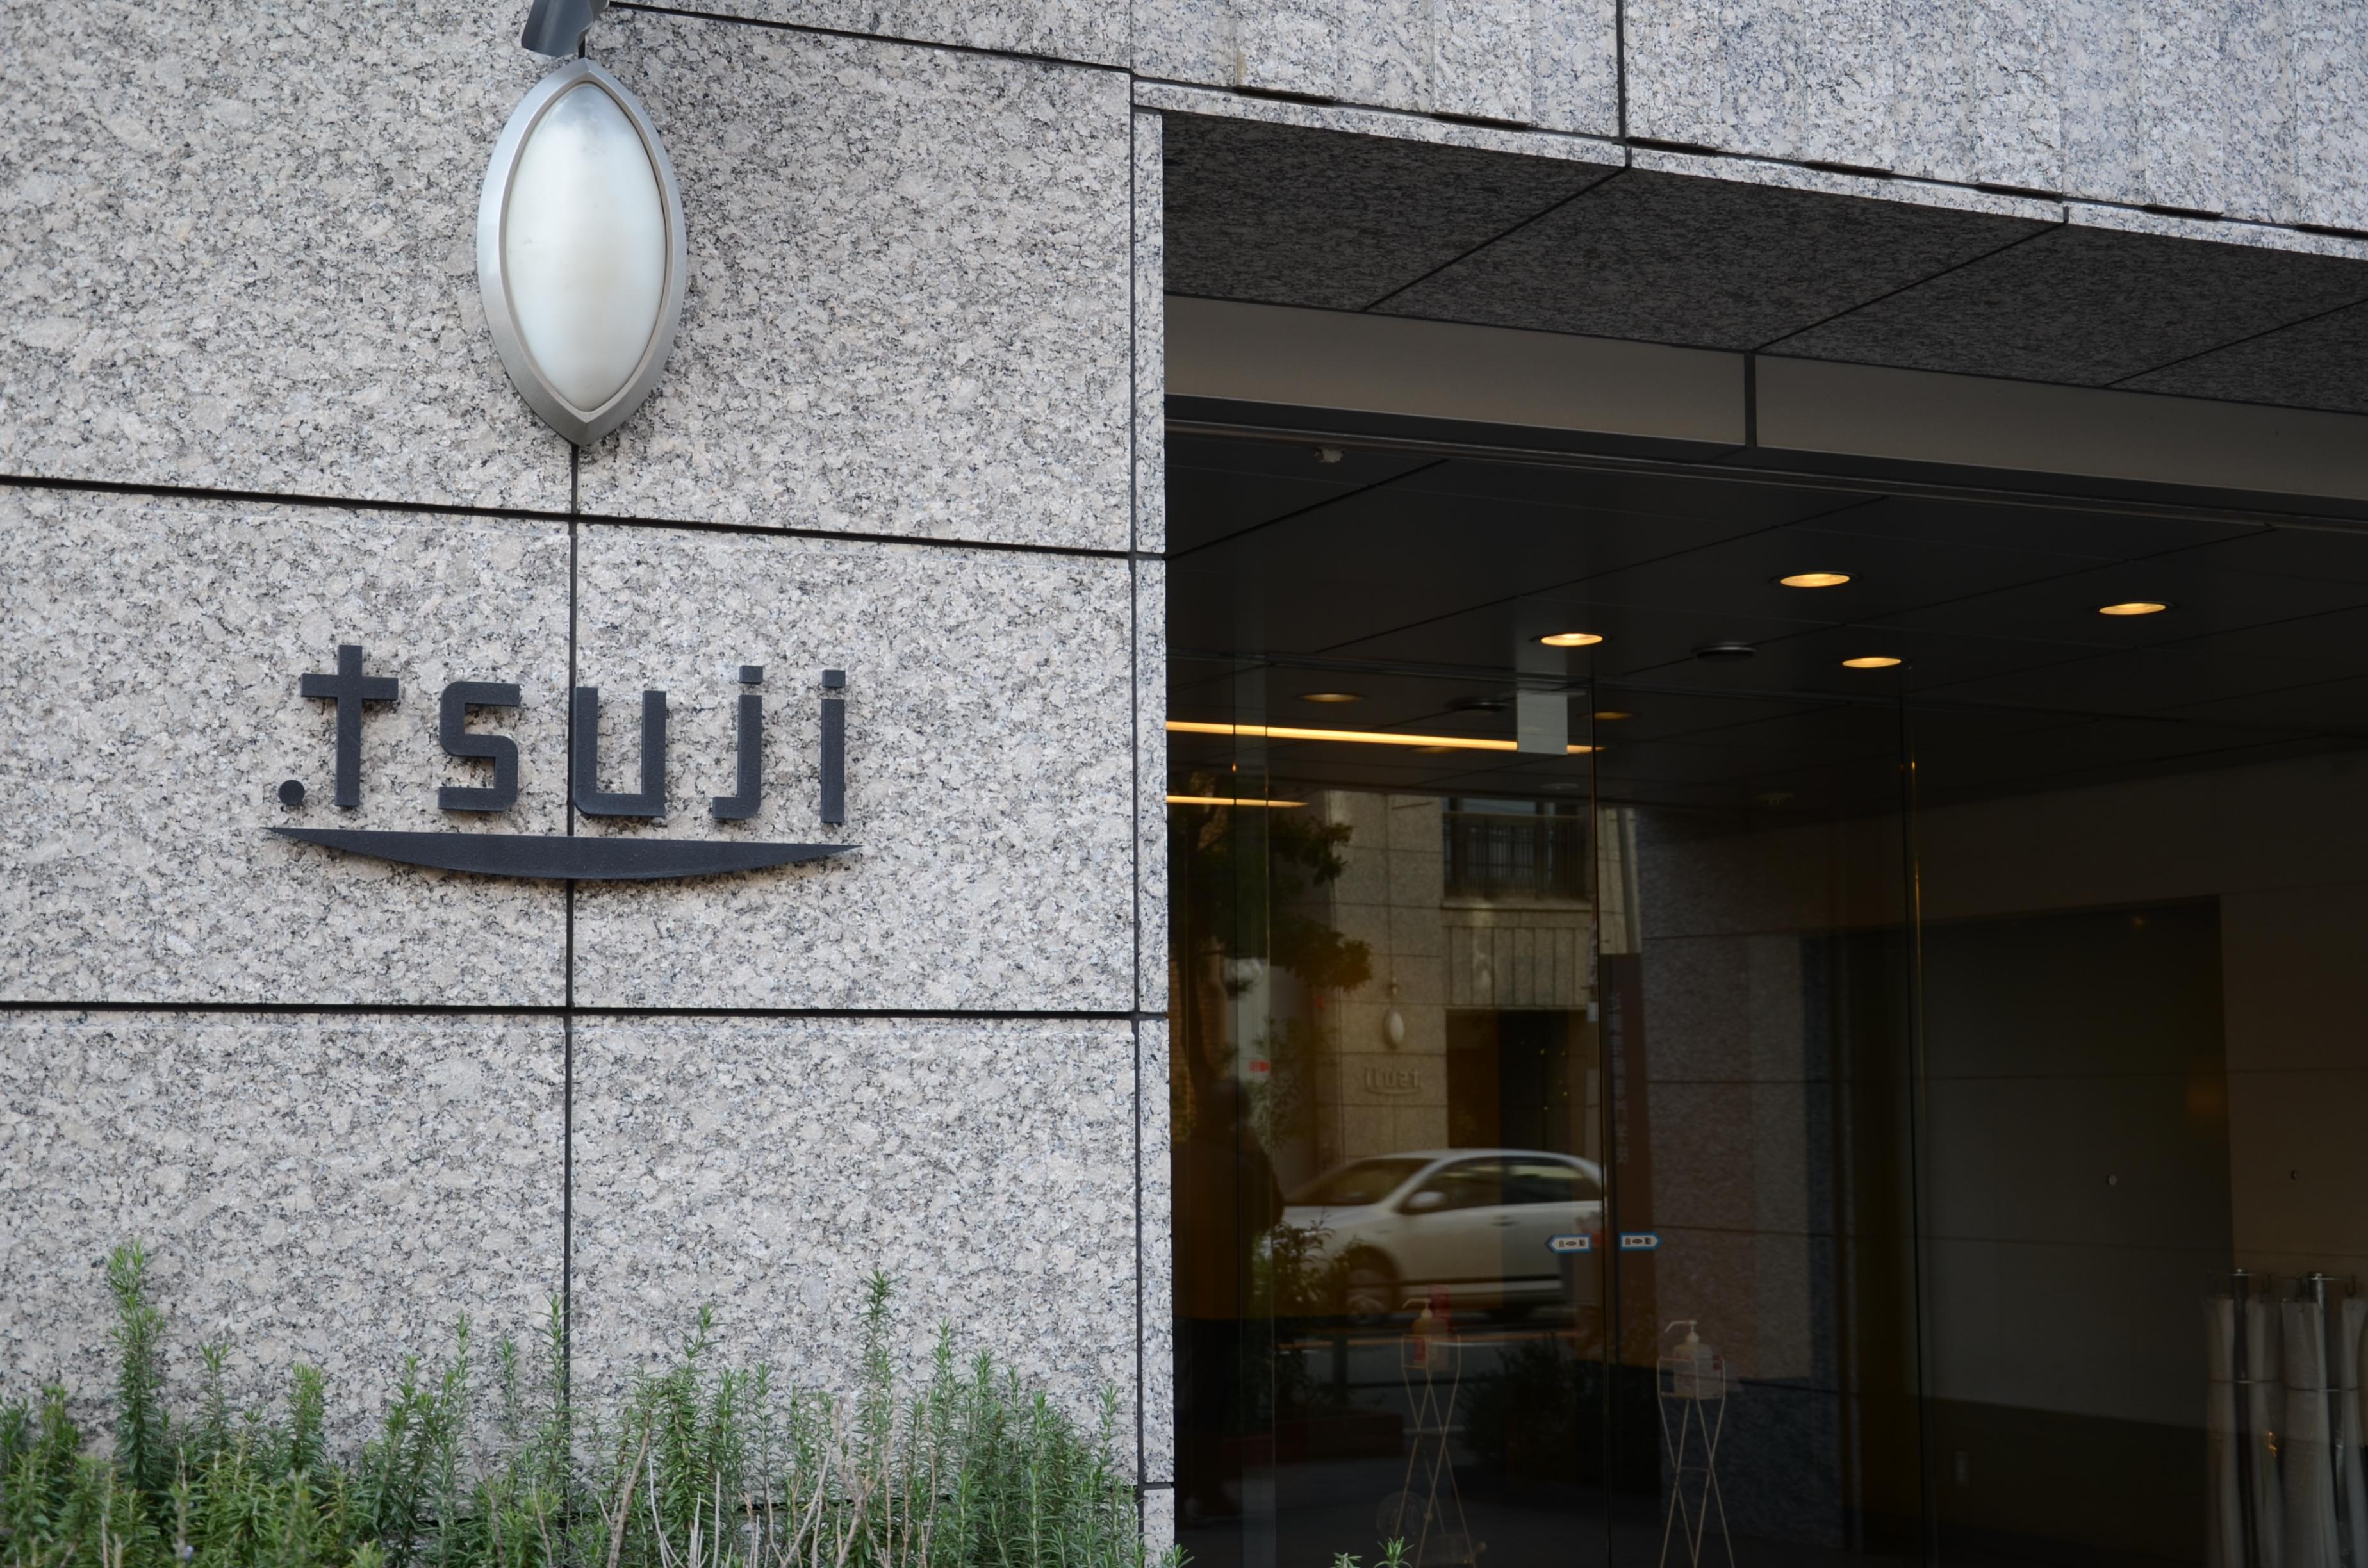 L'école Tsuji